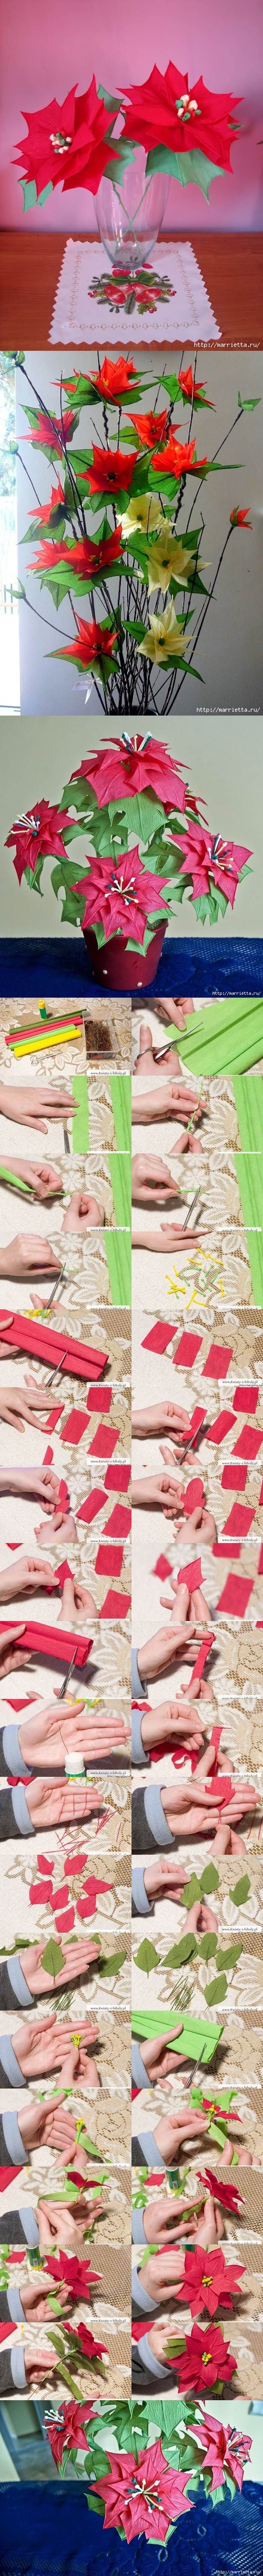 DIY Crepe Paper Poinsettia the Christmas Star | iCreativeIdeas.com Like Us on Facebook == https://www.facebook.com/icreativeideas